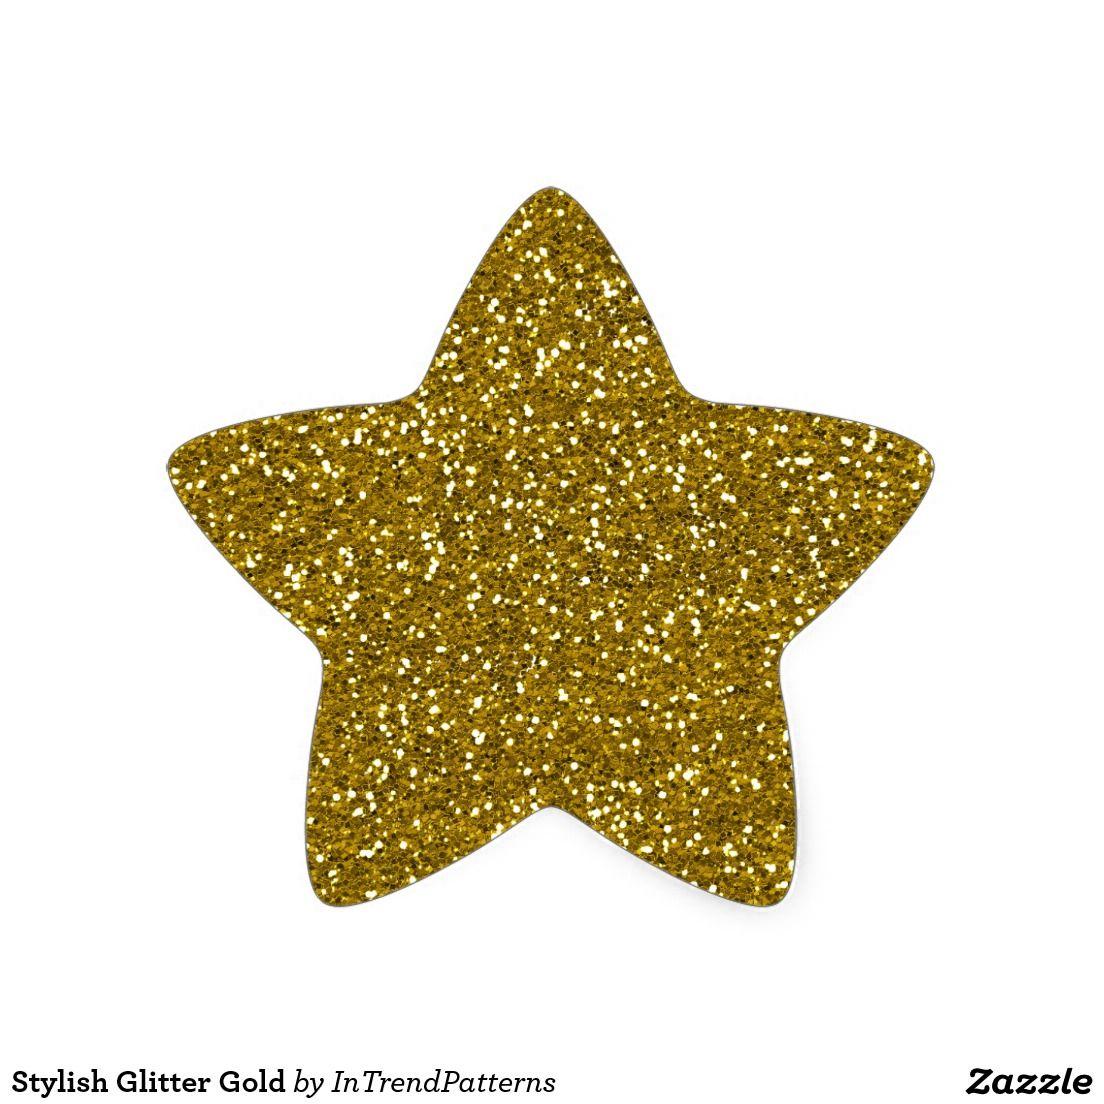 Stylish Glitter Gold Star Sticker Zazzle Com In 2021 Gold Star Stickers Star Stickers Glitter Stickers